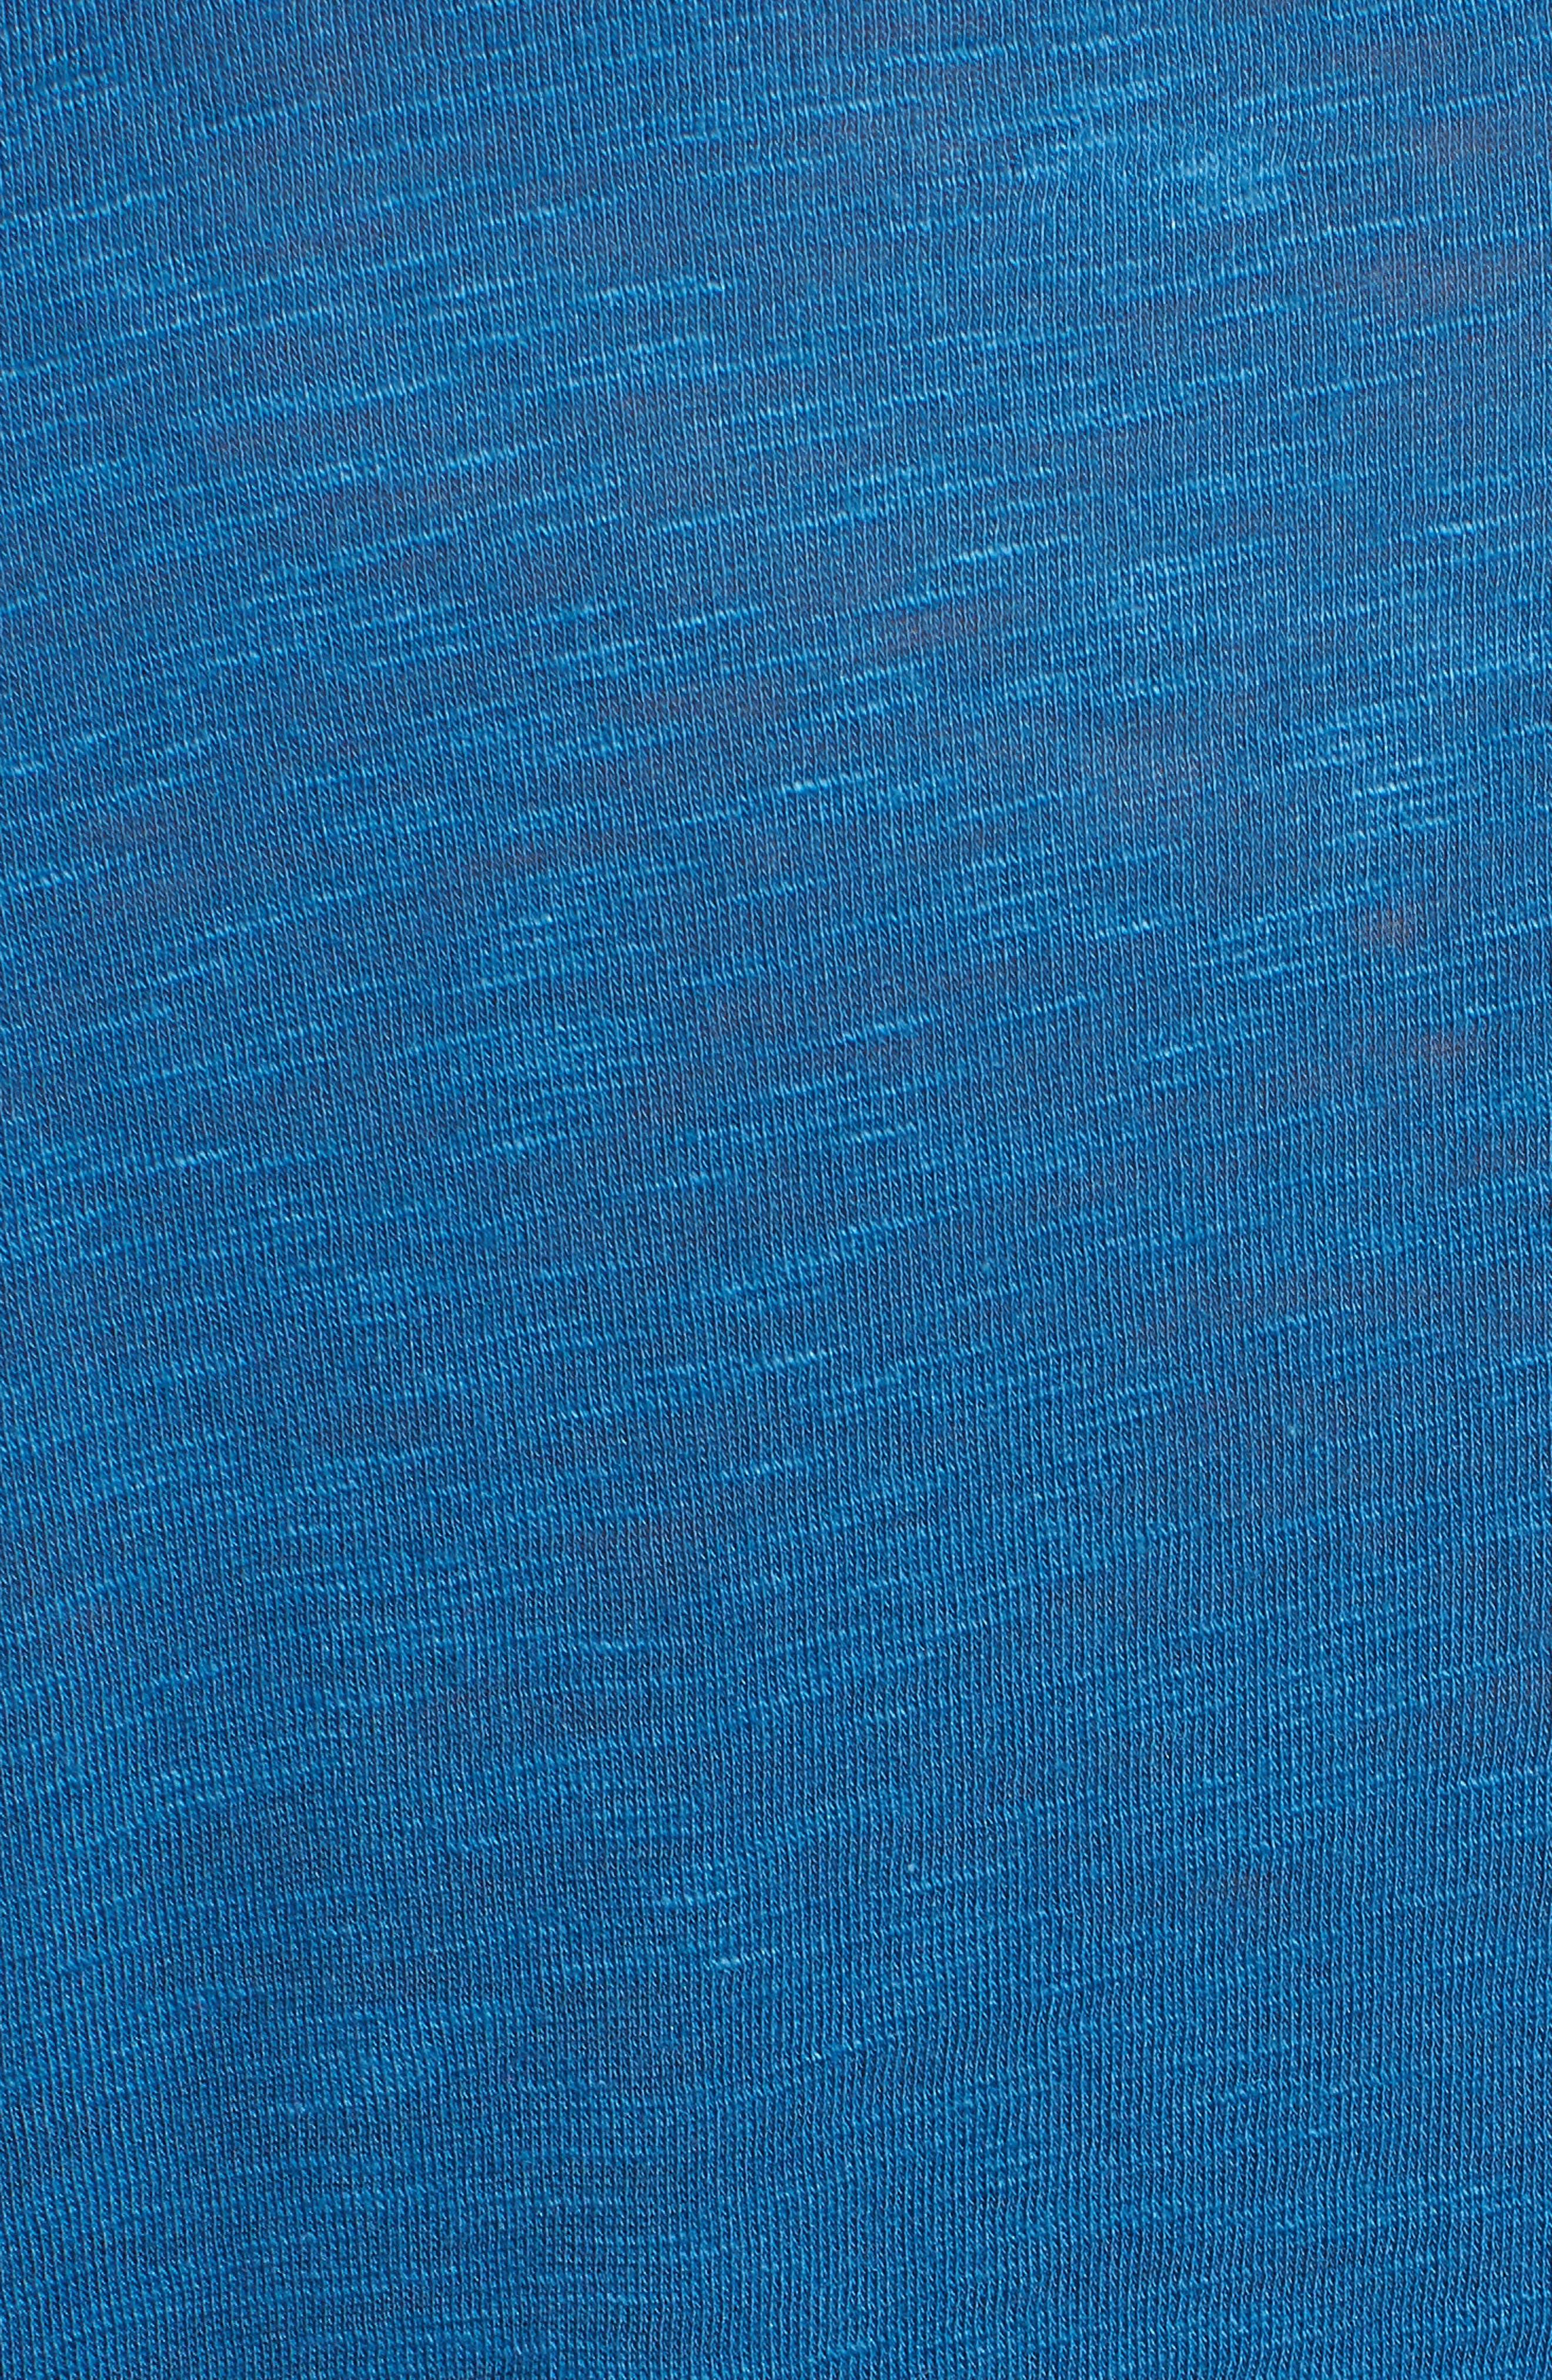 Long Sleeve Crewneck Tee,                             Alternate thumbnail 7, color,                             BLUE DARK